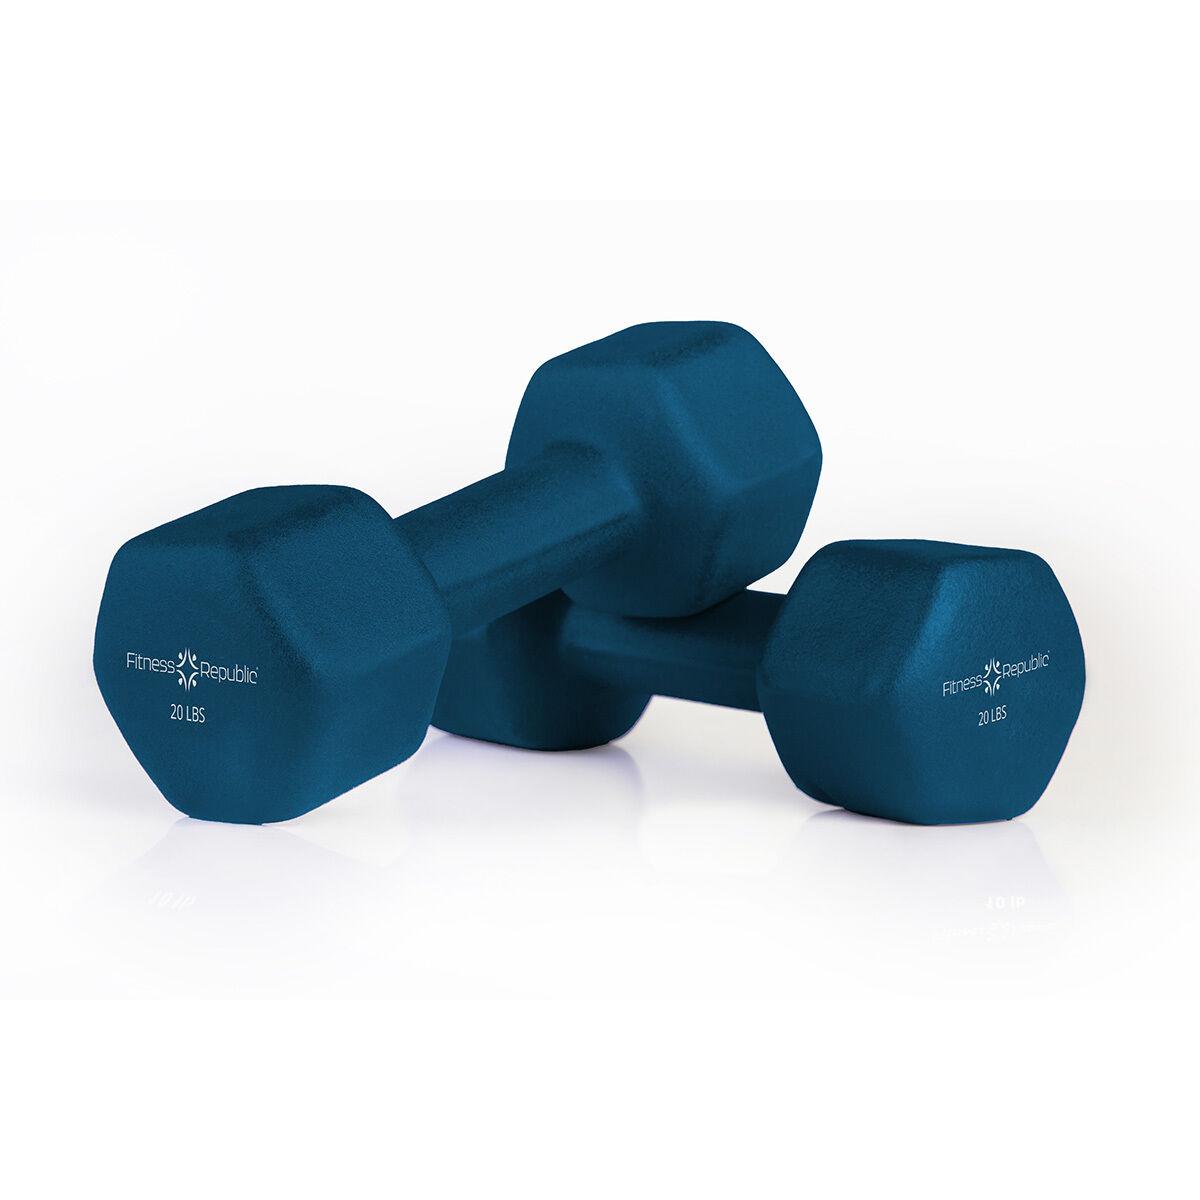 Fitness Republic Neoprene Dumbbells 20 lbs Set (Neoprene Weights)